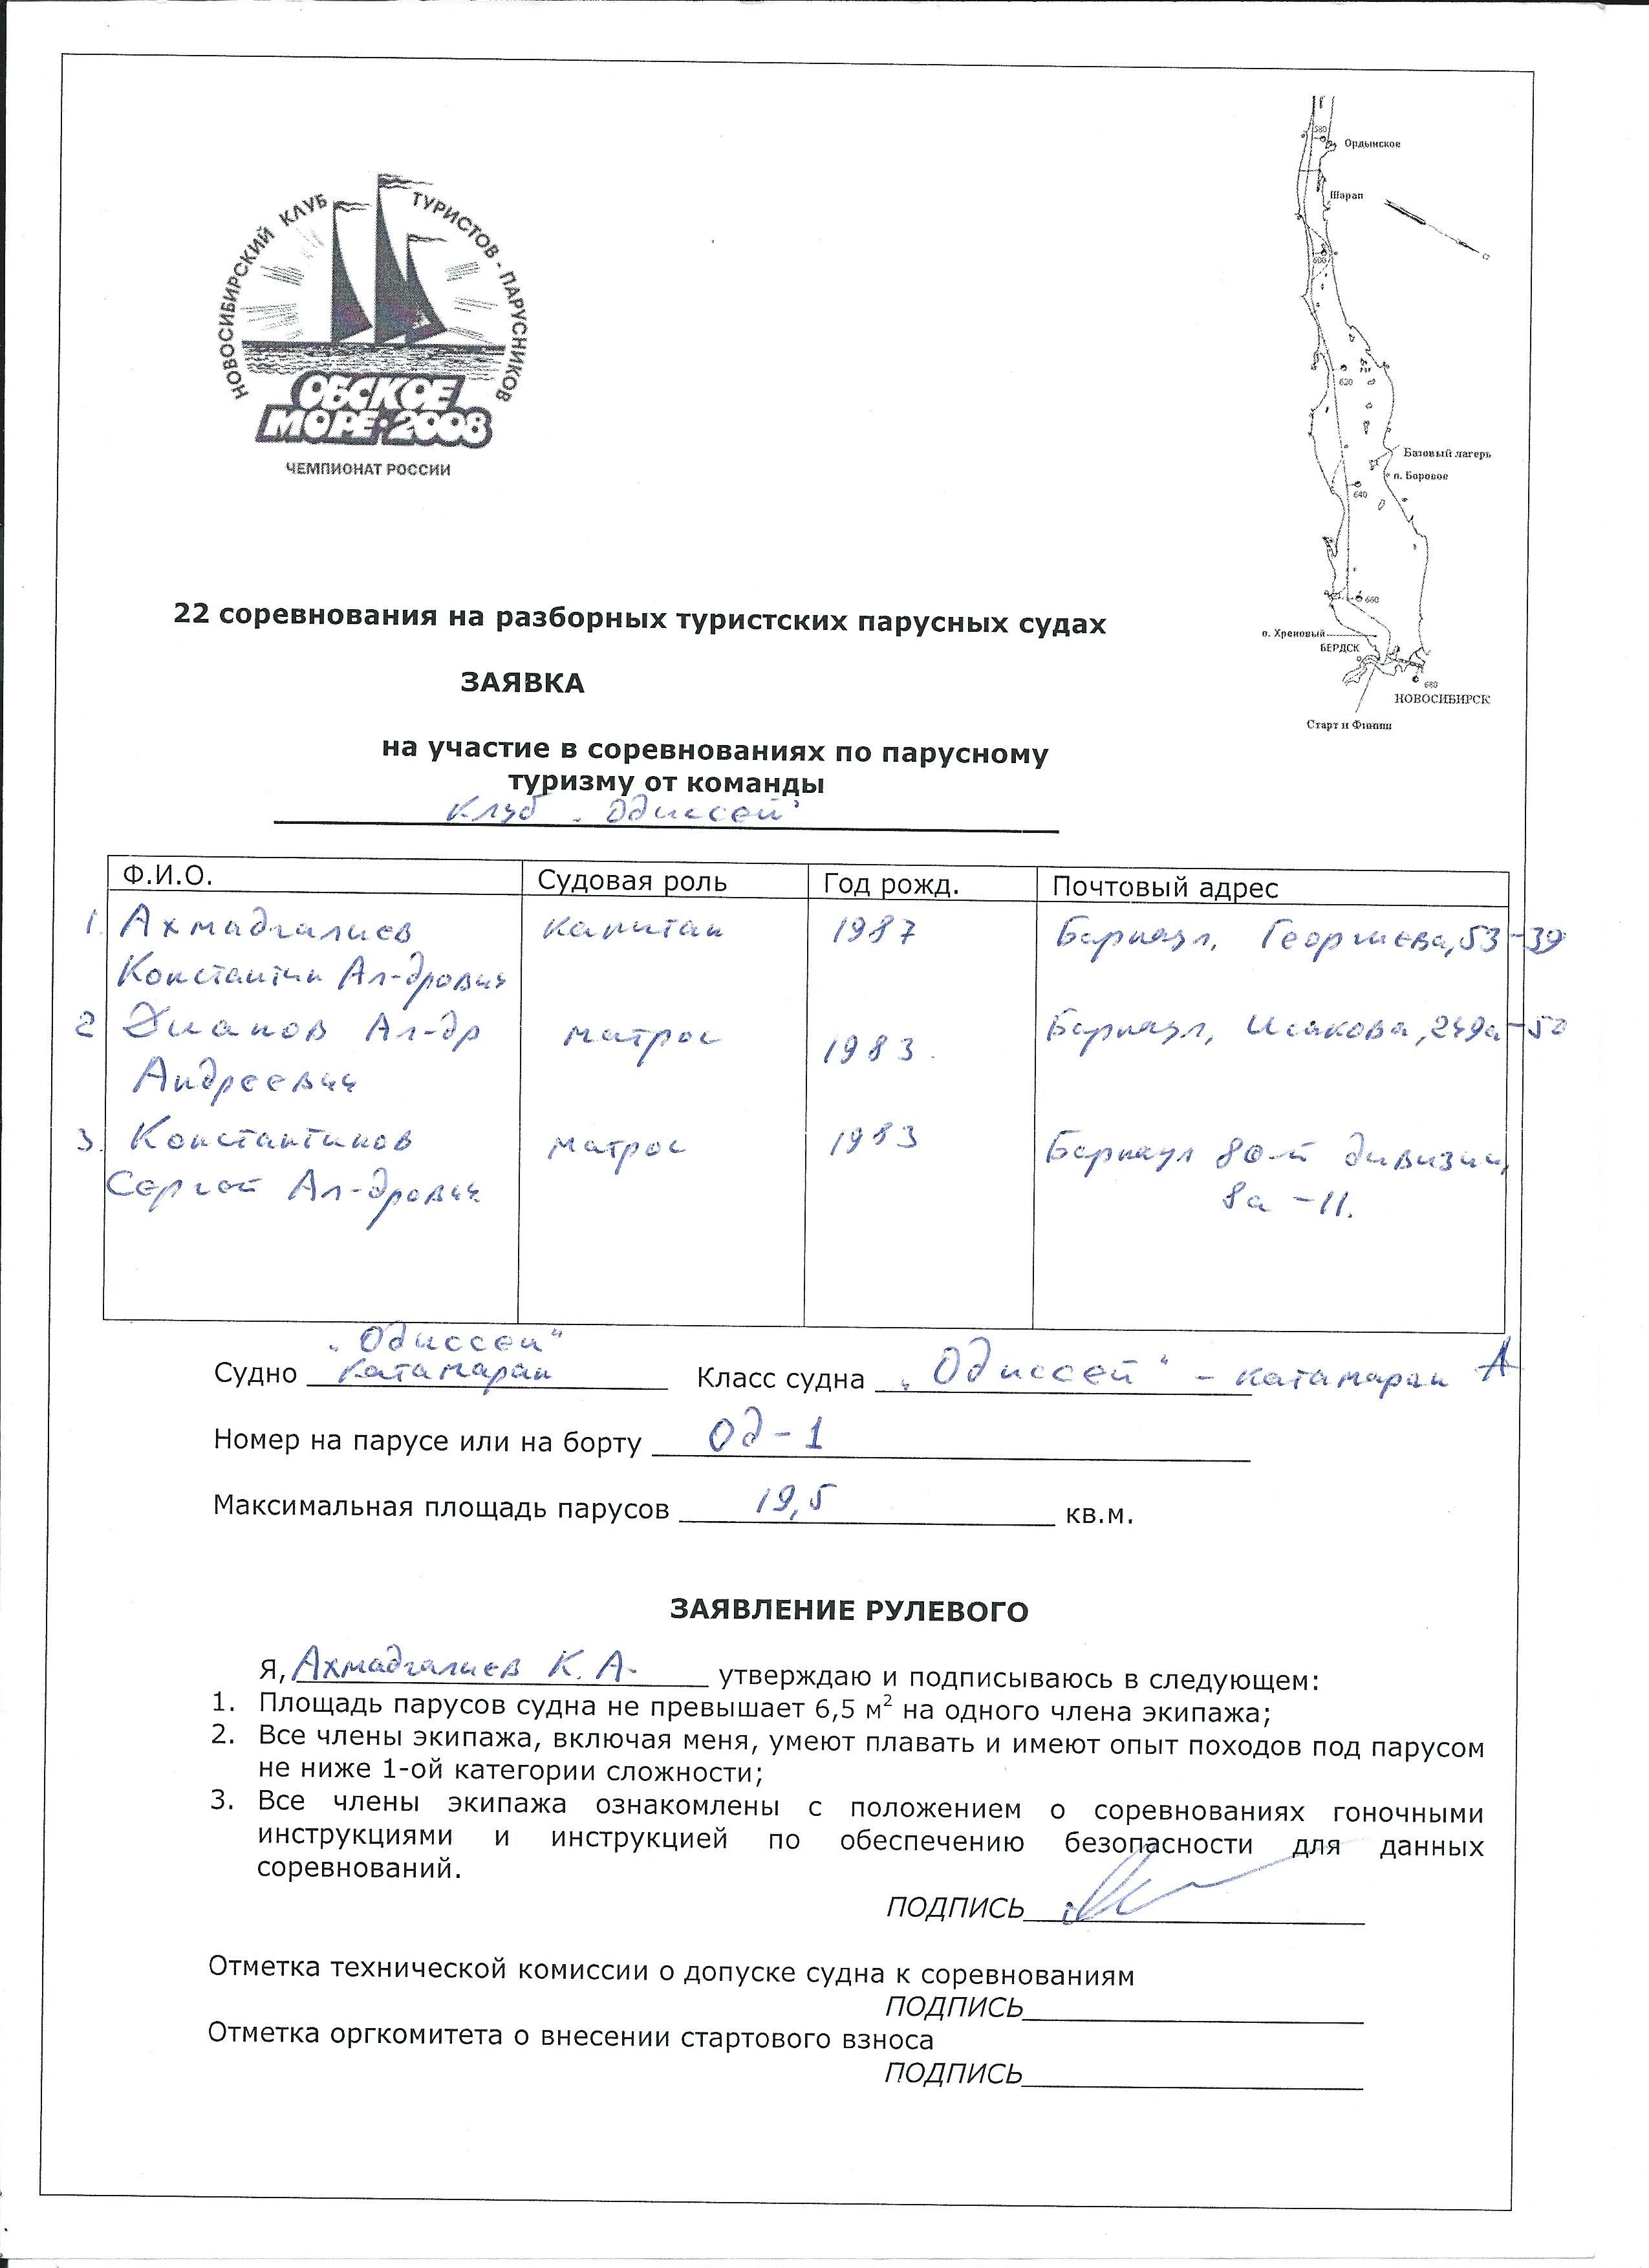 Ахмадгалиев К.А.